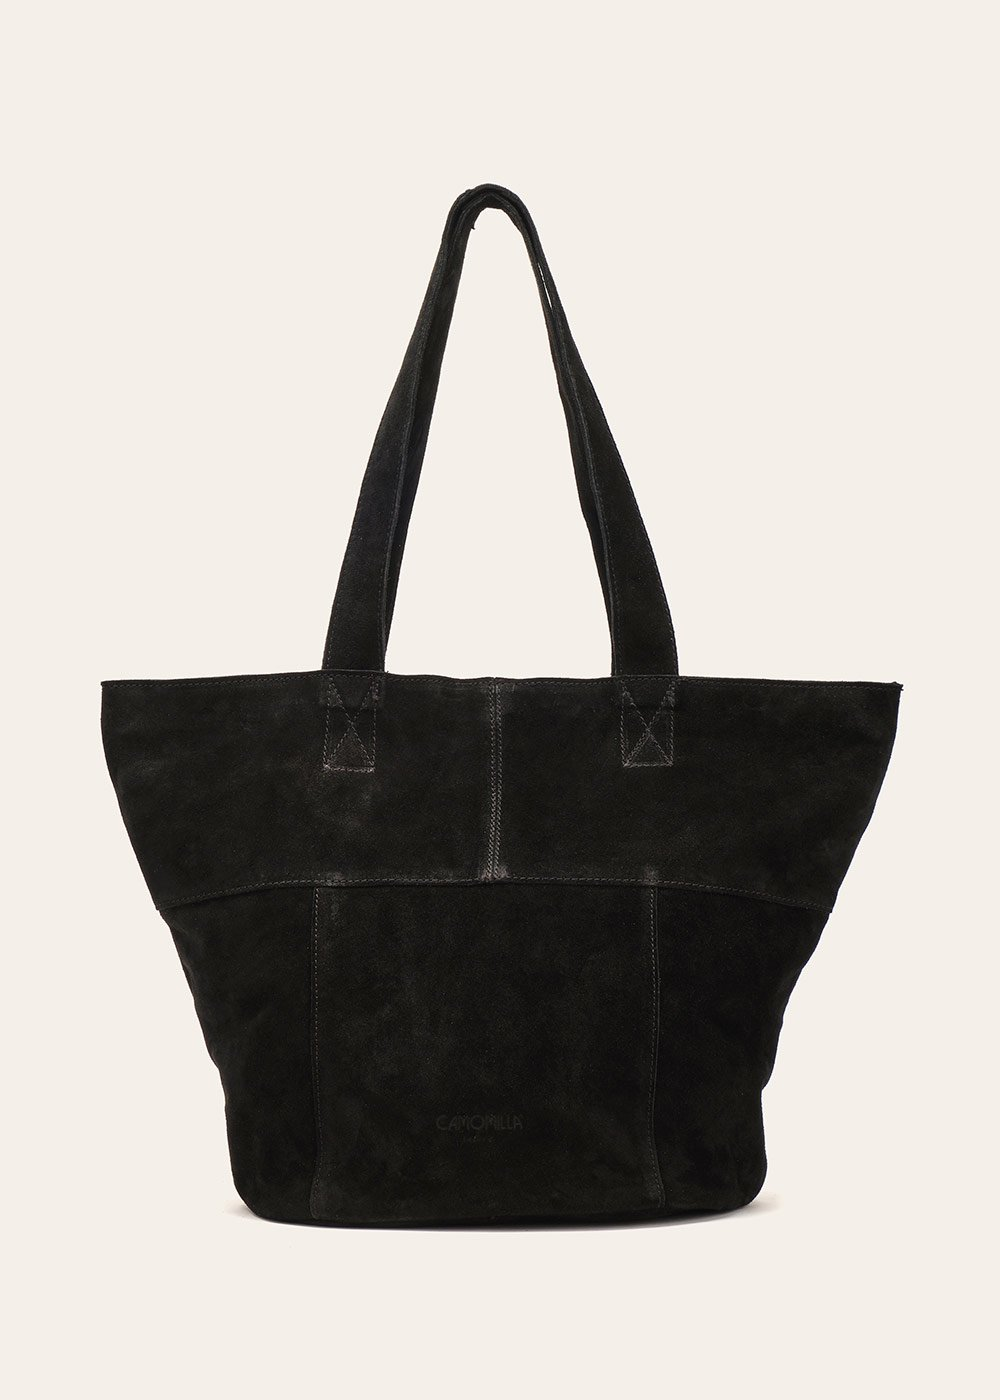 Shopping bag Britney in vera pelle sfoderata - Black - Donna